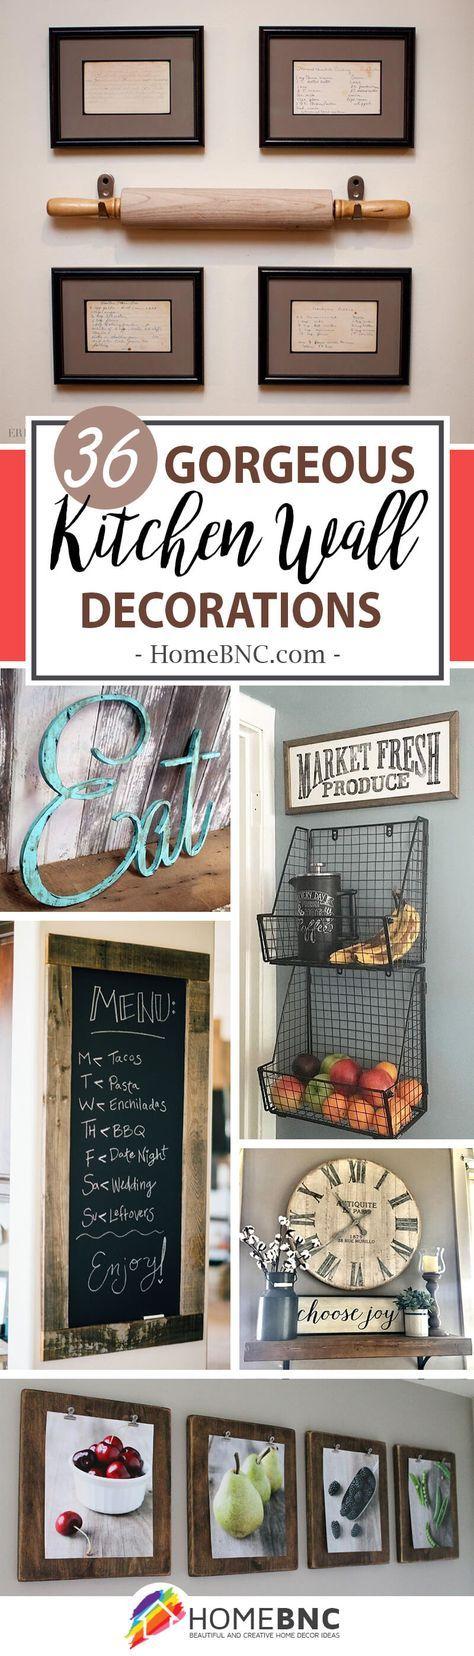 Creative Kitchen: 36 Awesome Kitchen Wall Decor Ideas. Kitchen design. #kitchendecor #kitcheninspiration